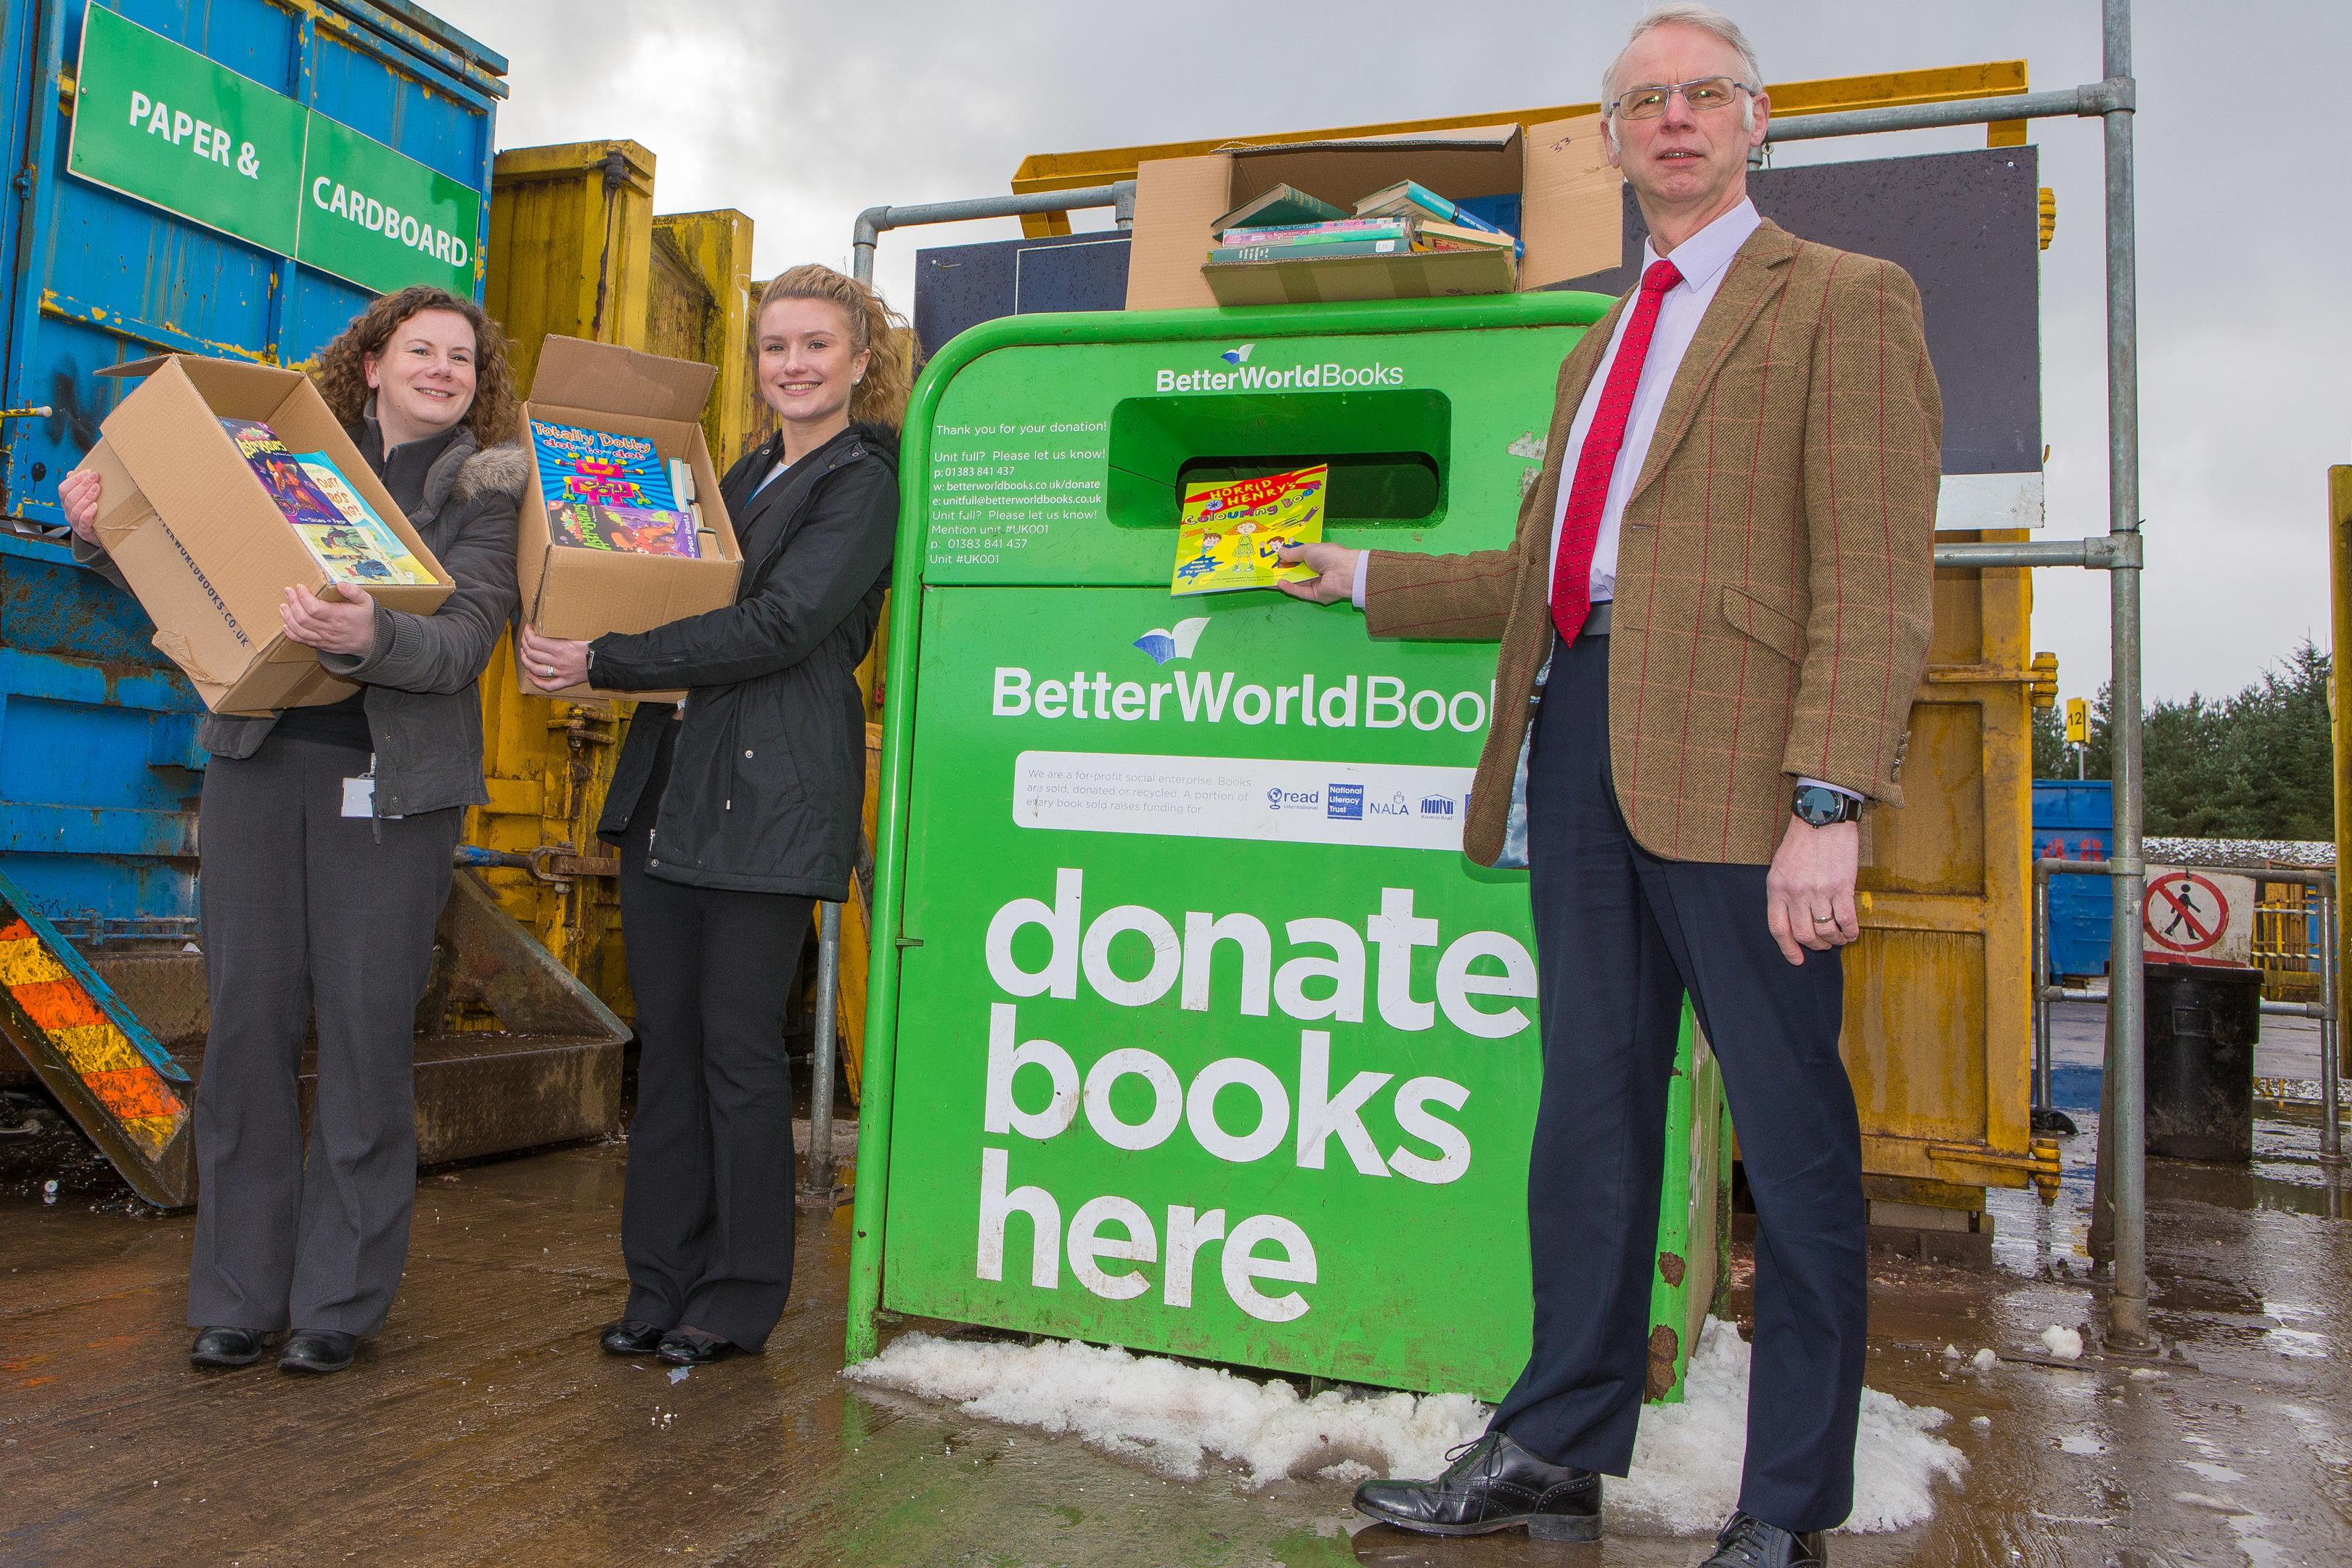 Emma Houston and Fiona Marshall from Better World Books with John Wincott